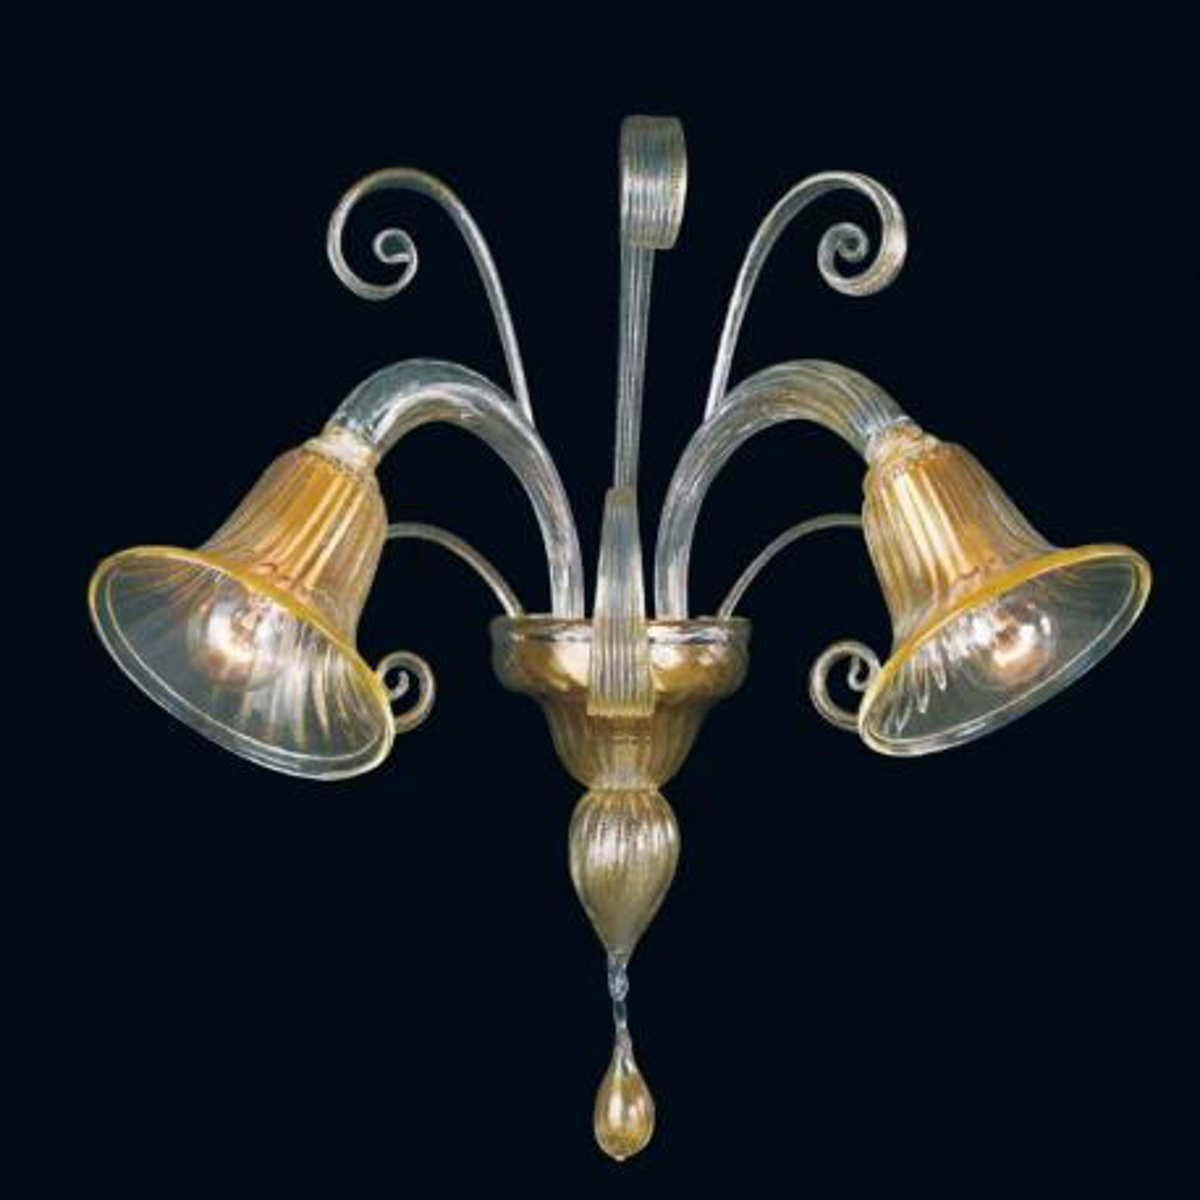 """Karlyn"" Murano glas wandleuchte - 2 flammig - gold"